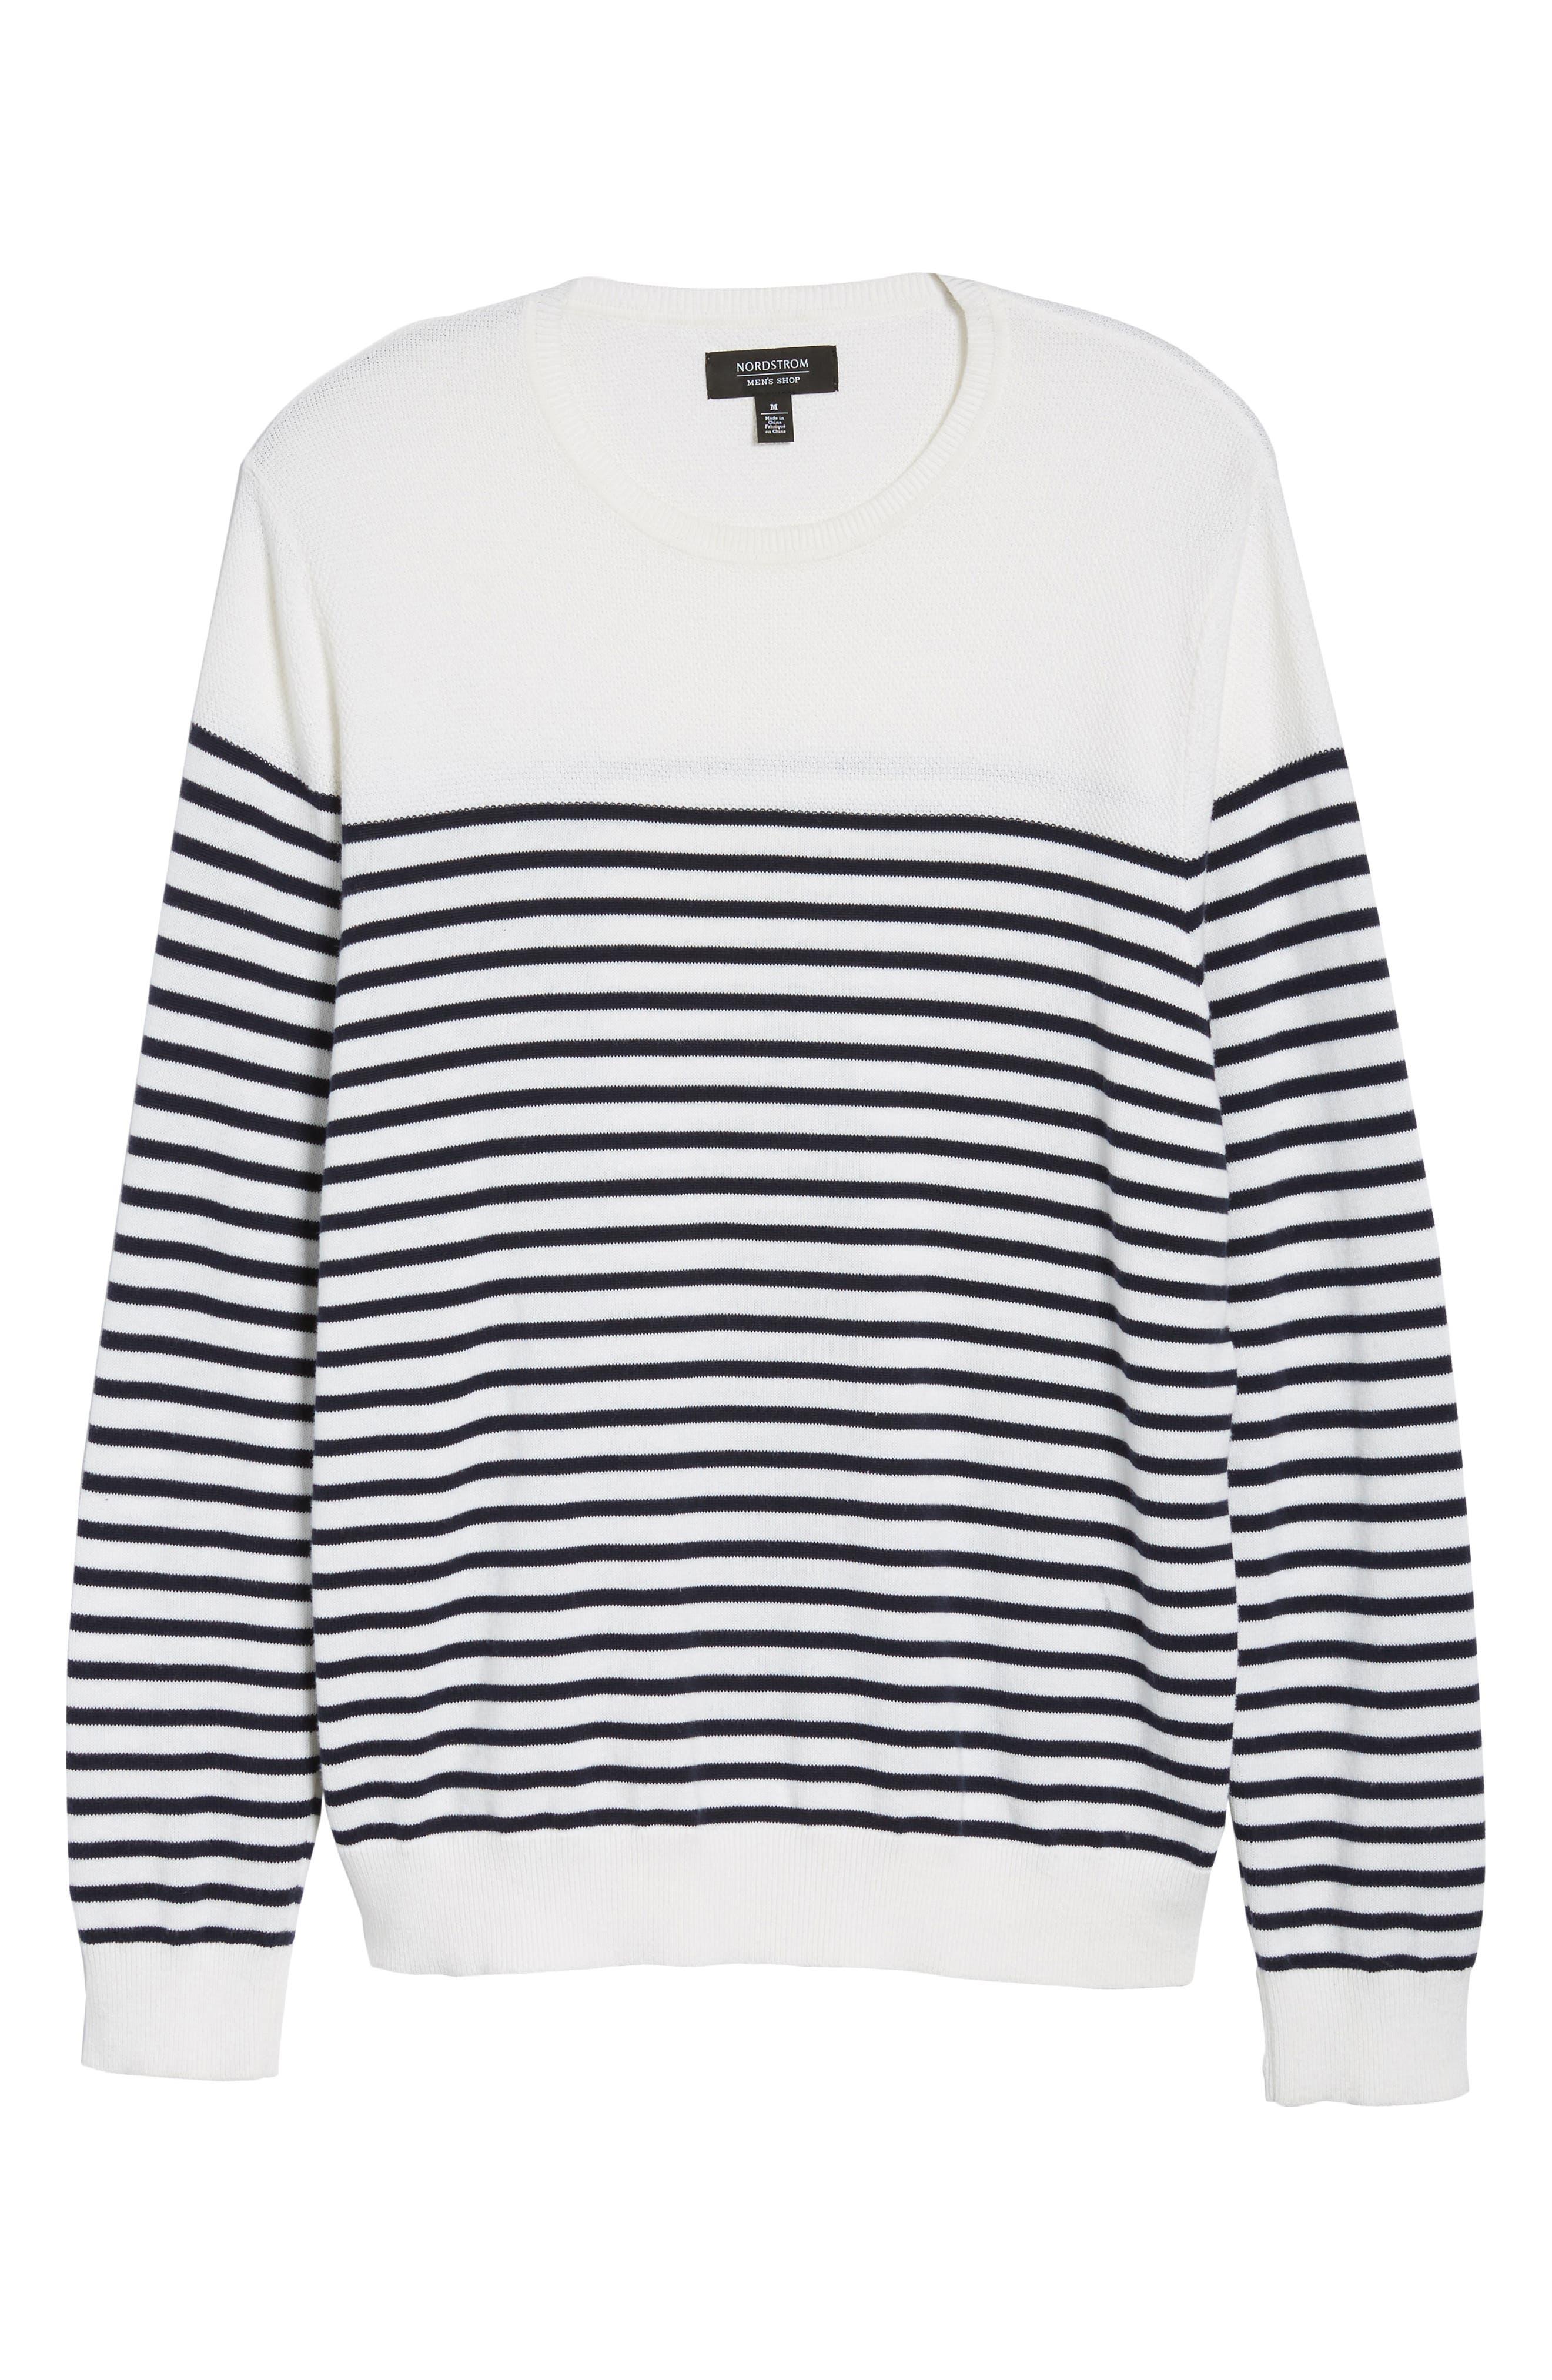 Breton Stripe Sweater,                             Alternate thumbnail 6, color,                             White Navy Stripe